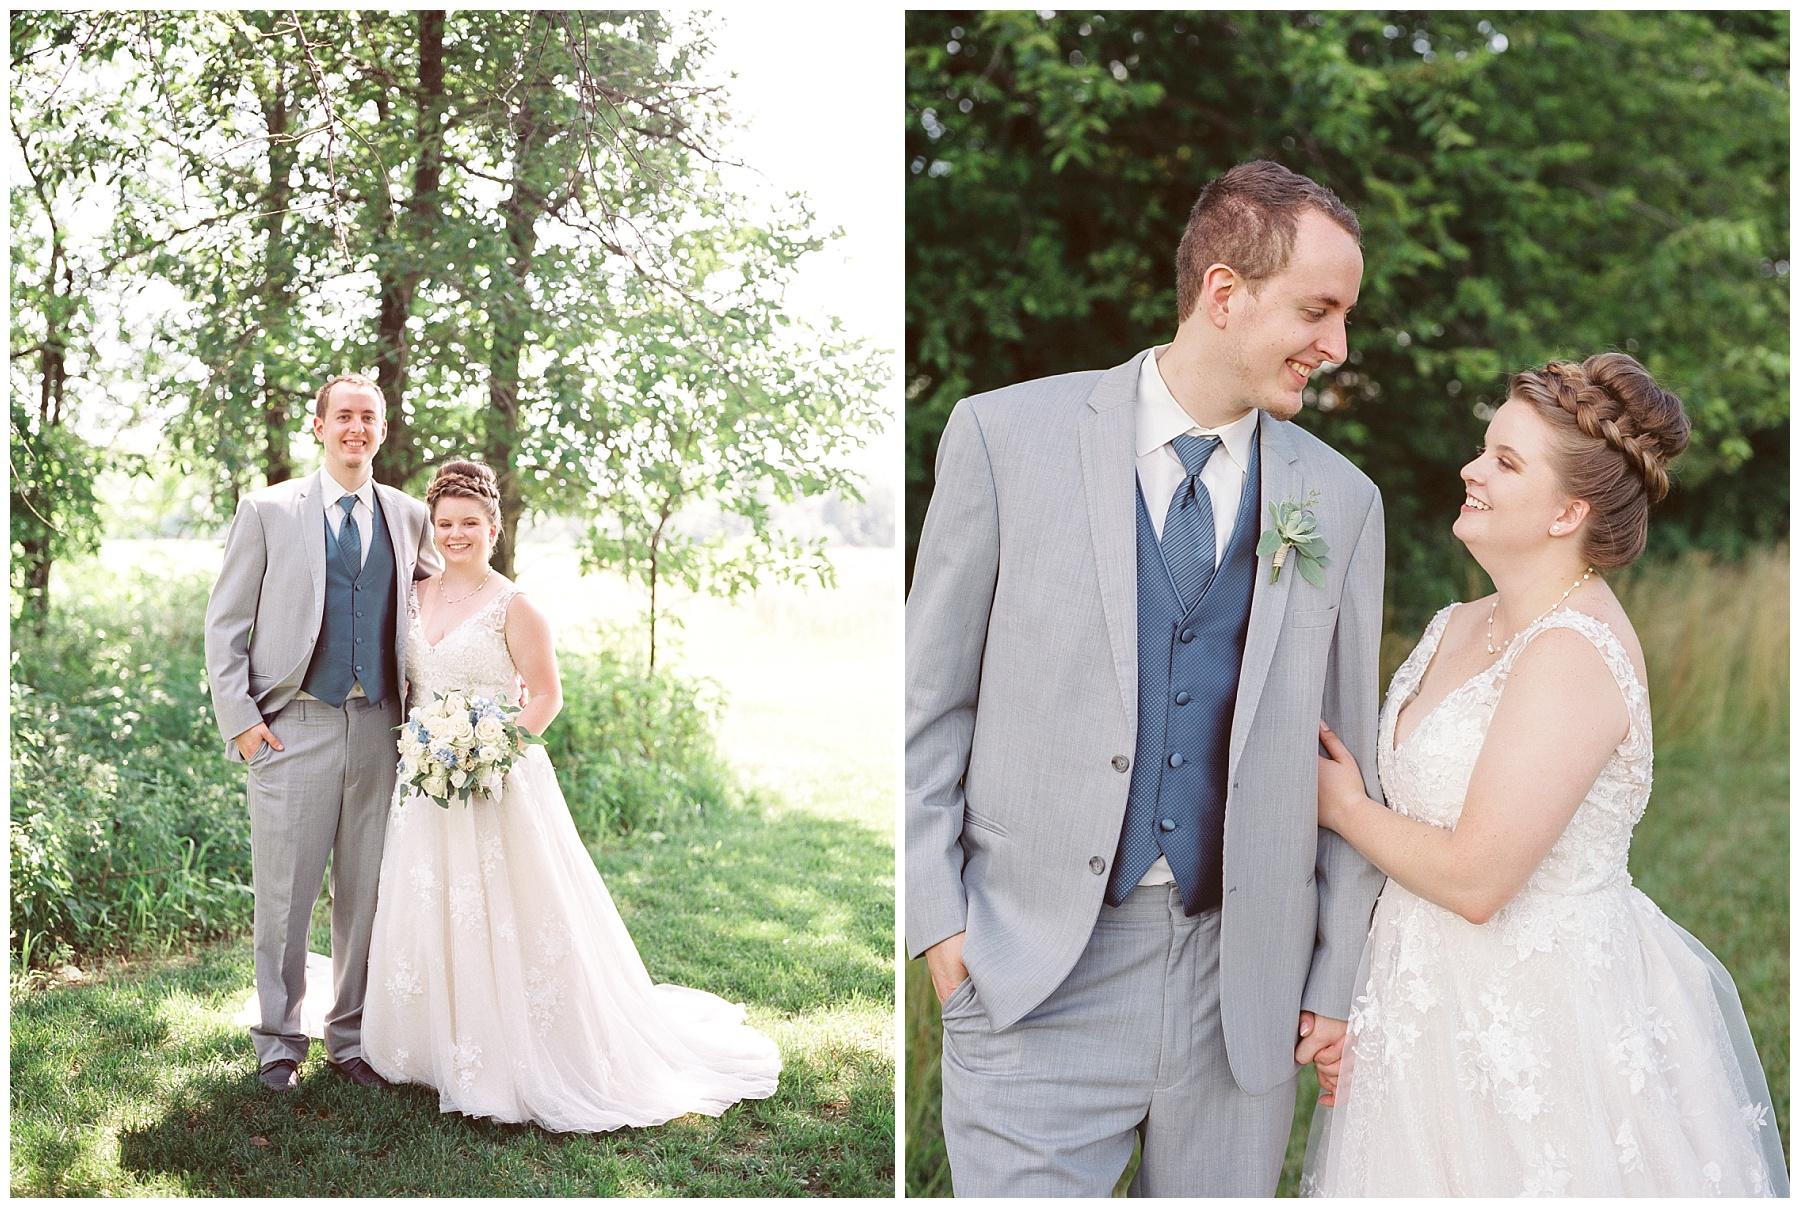 Intimate Summer Wedding at Emerson Fields by Kelsi Kliethermes Photography Best Missouri and Maui Wedding Photographer_0036.jpg